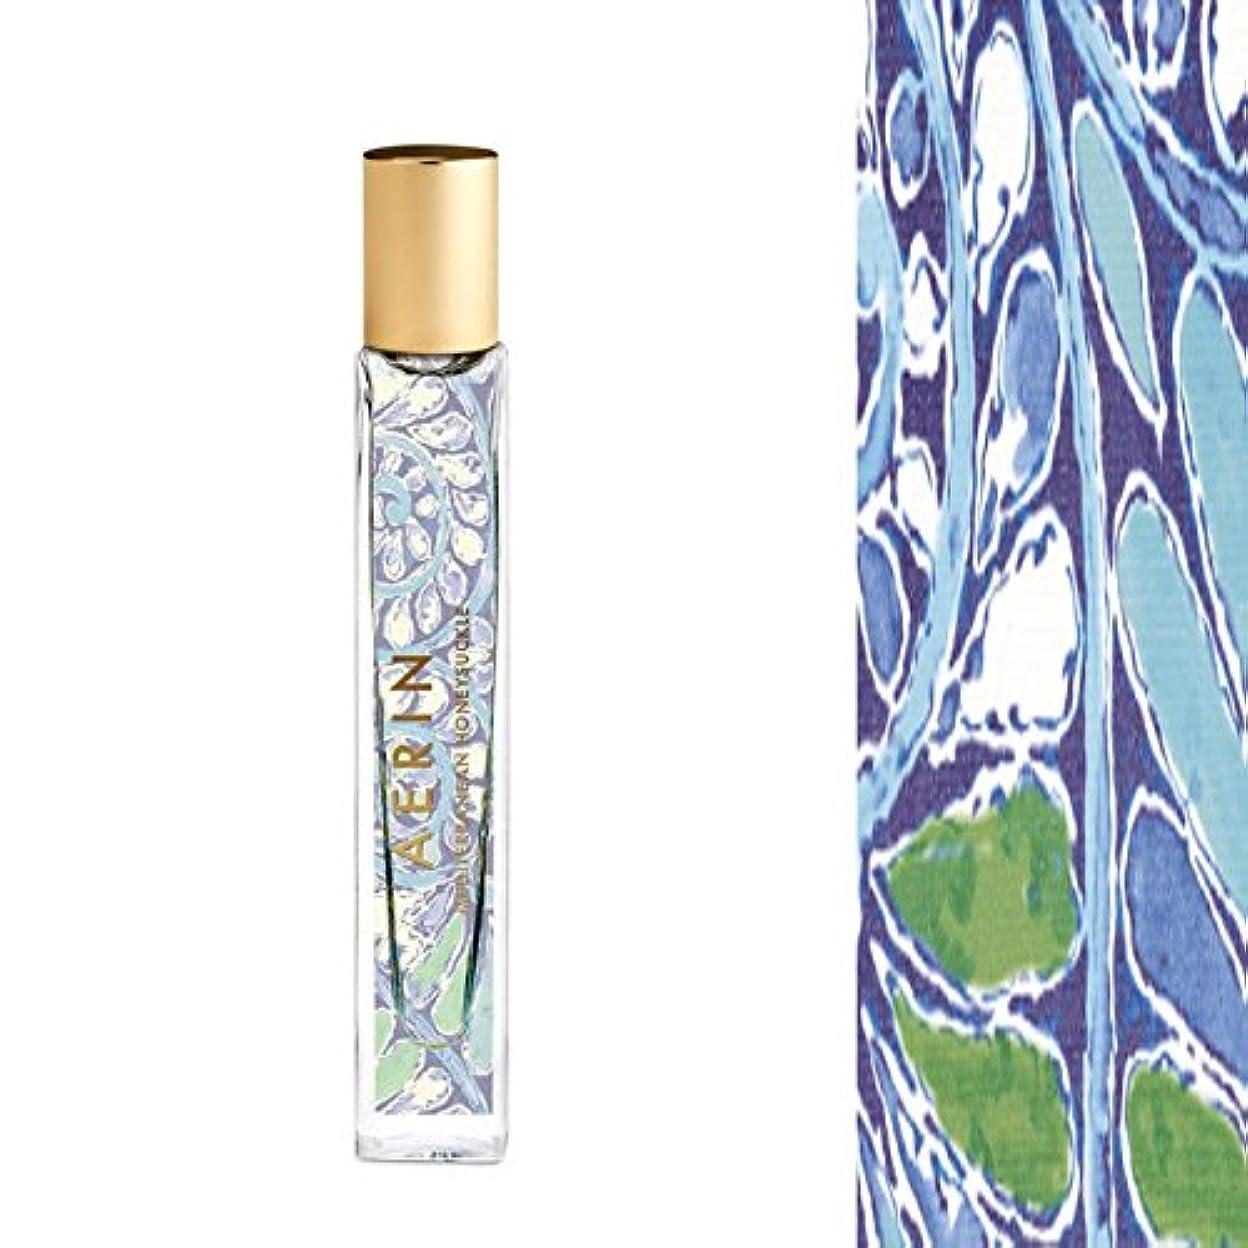 一部期限切れ家庭教師AERIN Beauty Mediterranean Honeysuckle Eau de Parfum Rollerball, 0.27oz [海外直送品] [並行輸入品]